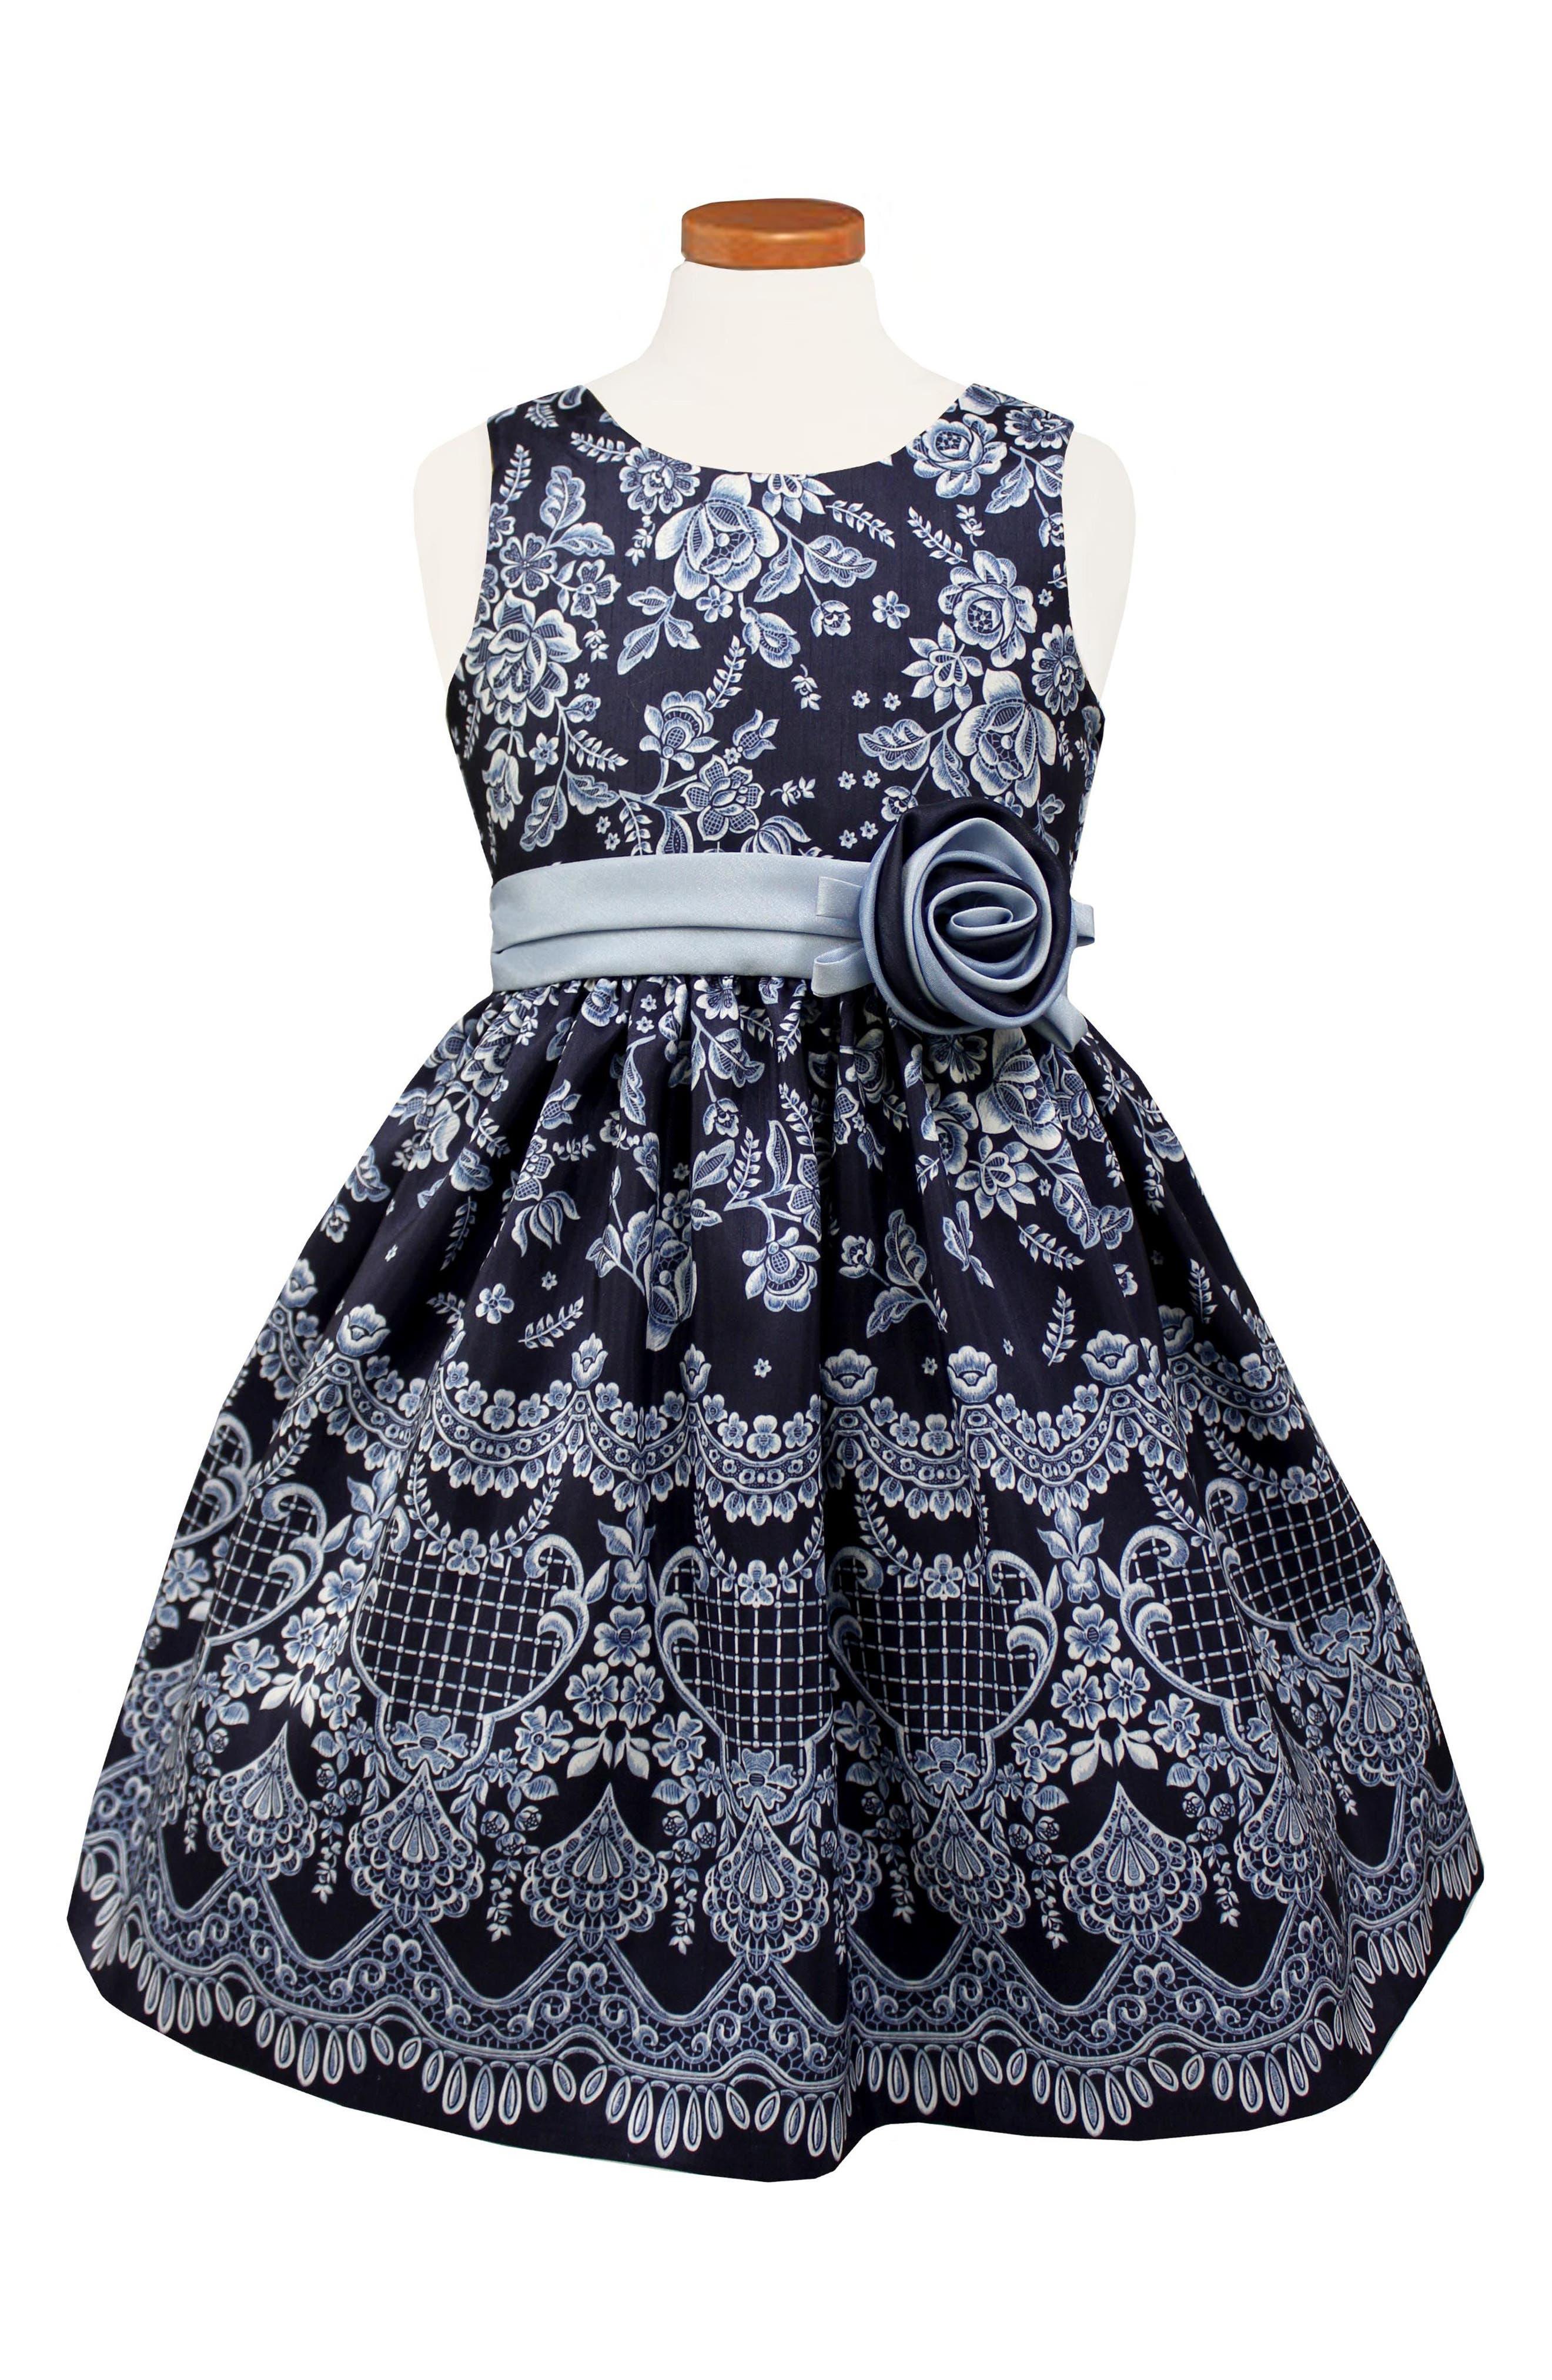 Alternate Image 1 Selected - Sorbet Floral Print Shantung Dress (Toddler Girls & Little Girls)